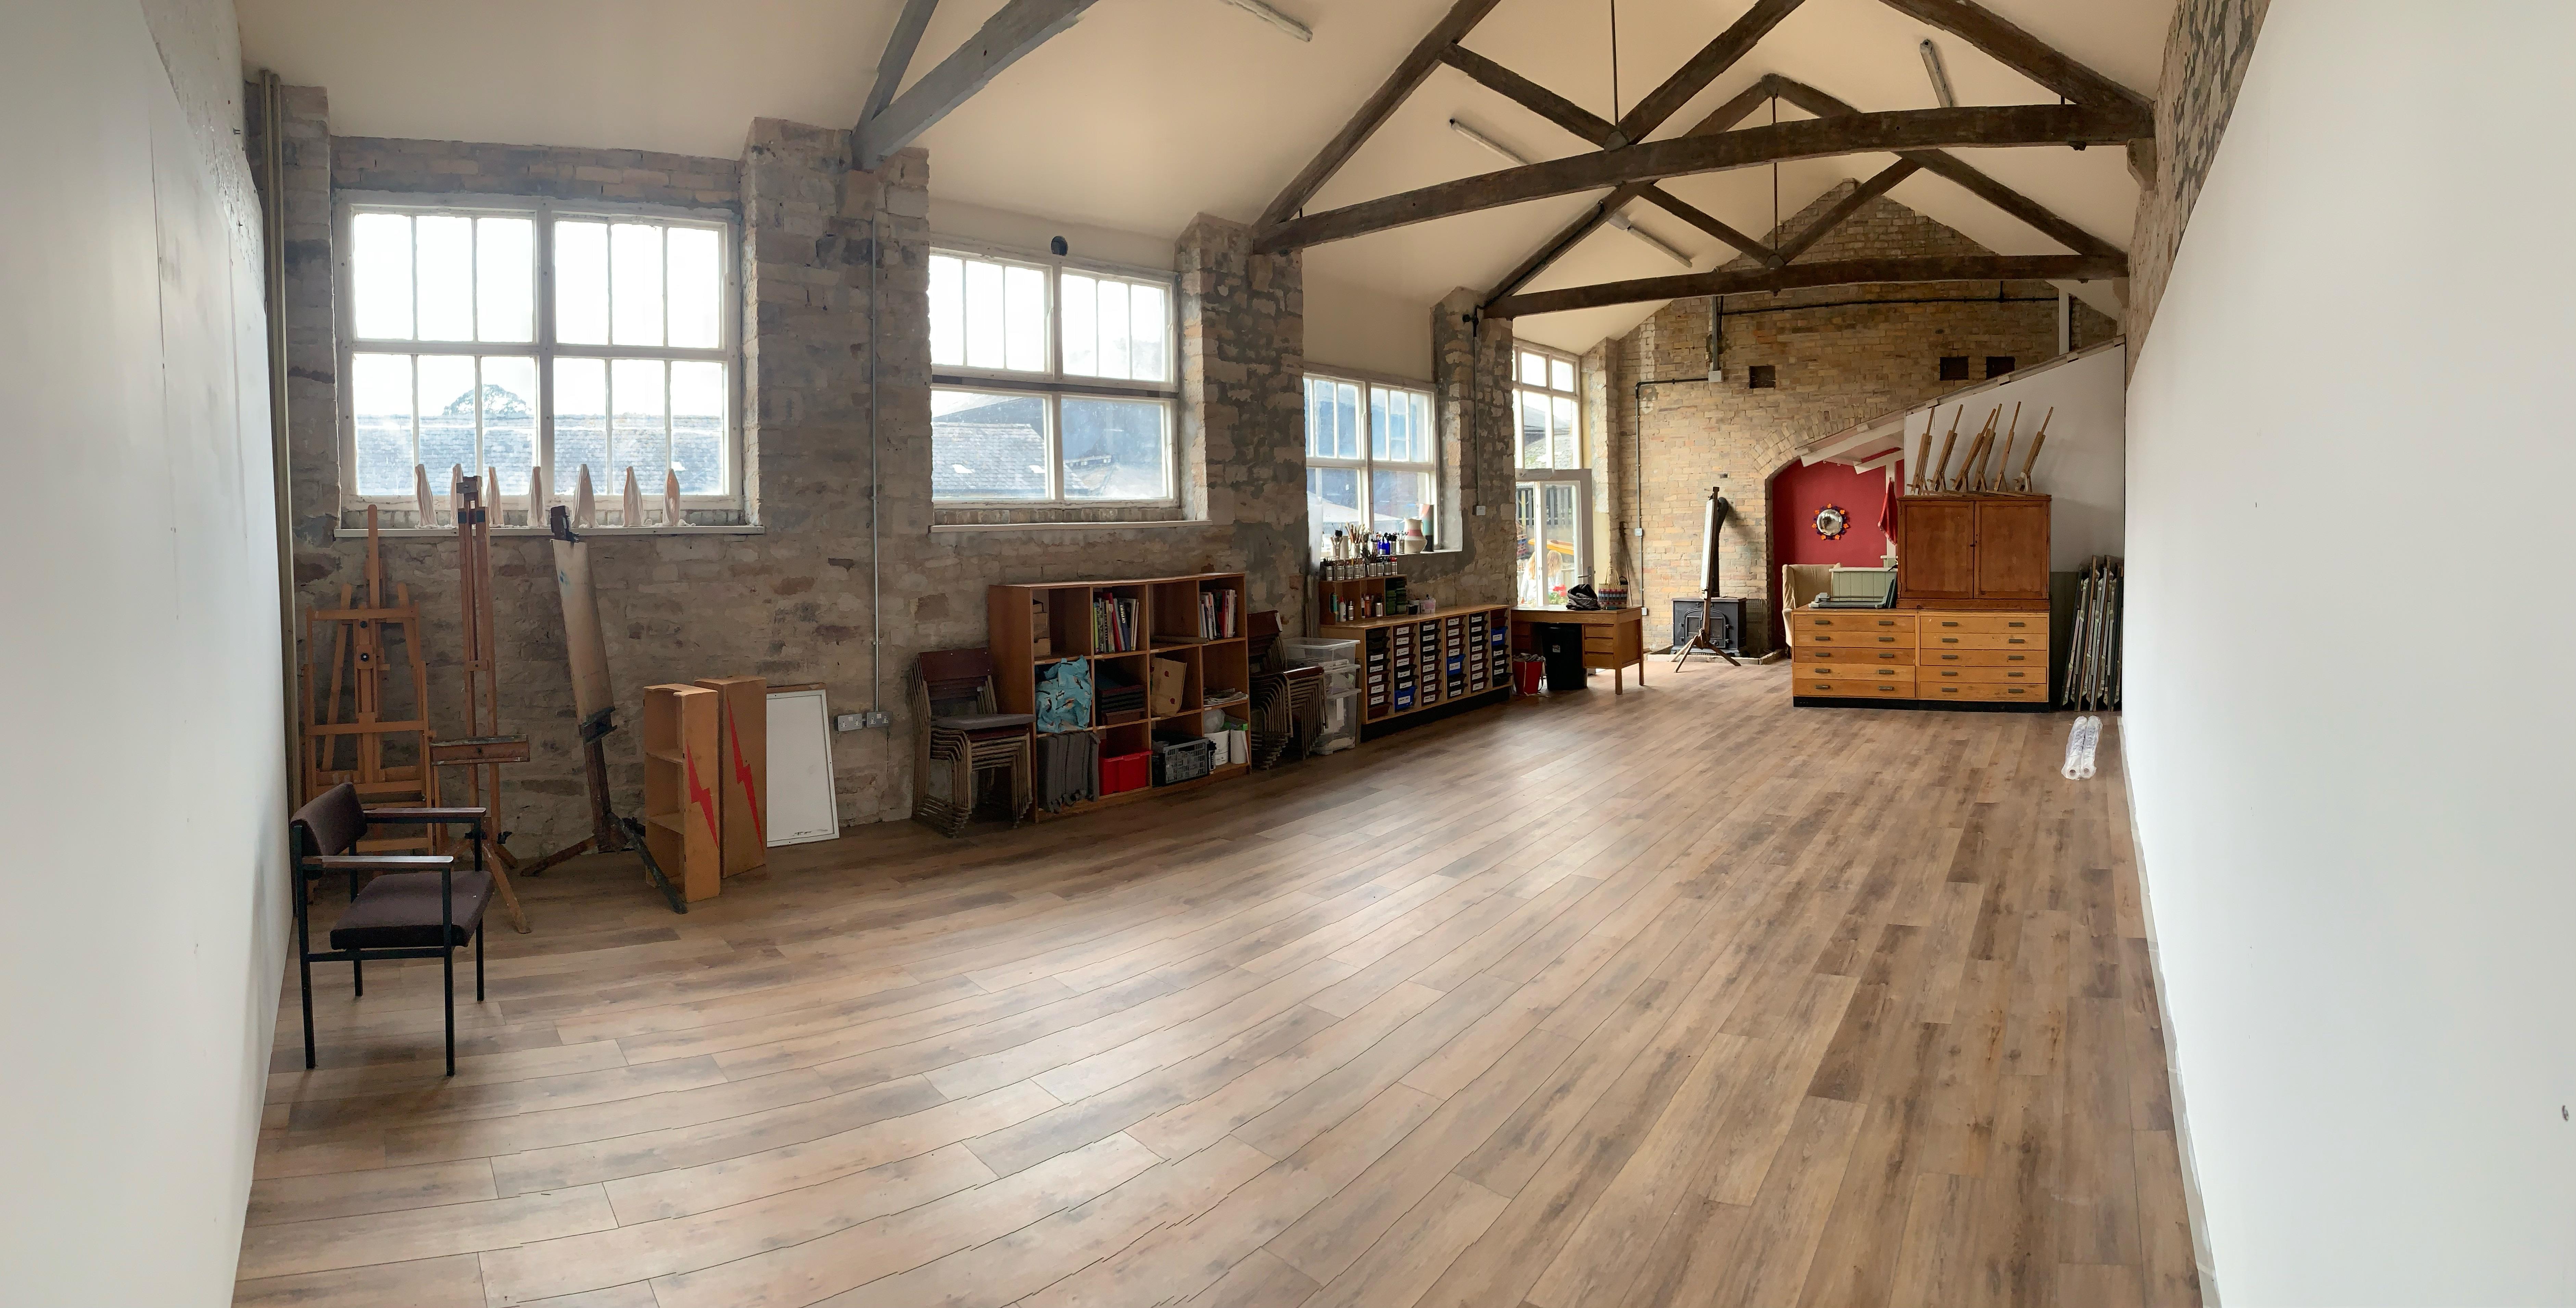 LOOK! my new teaching studio at Wheelbirks